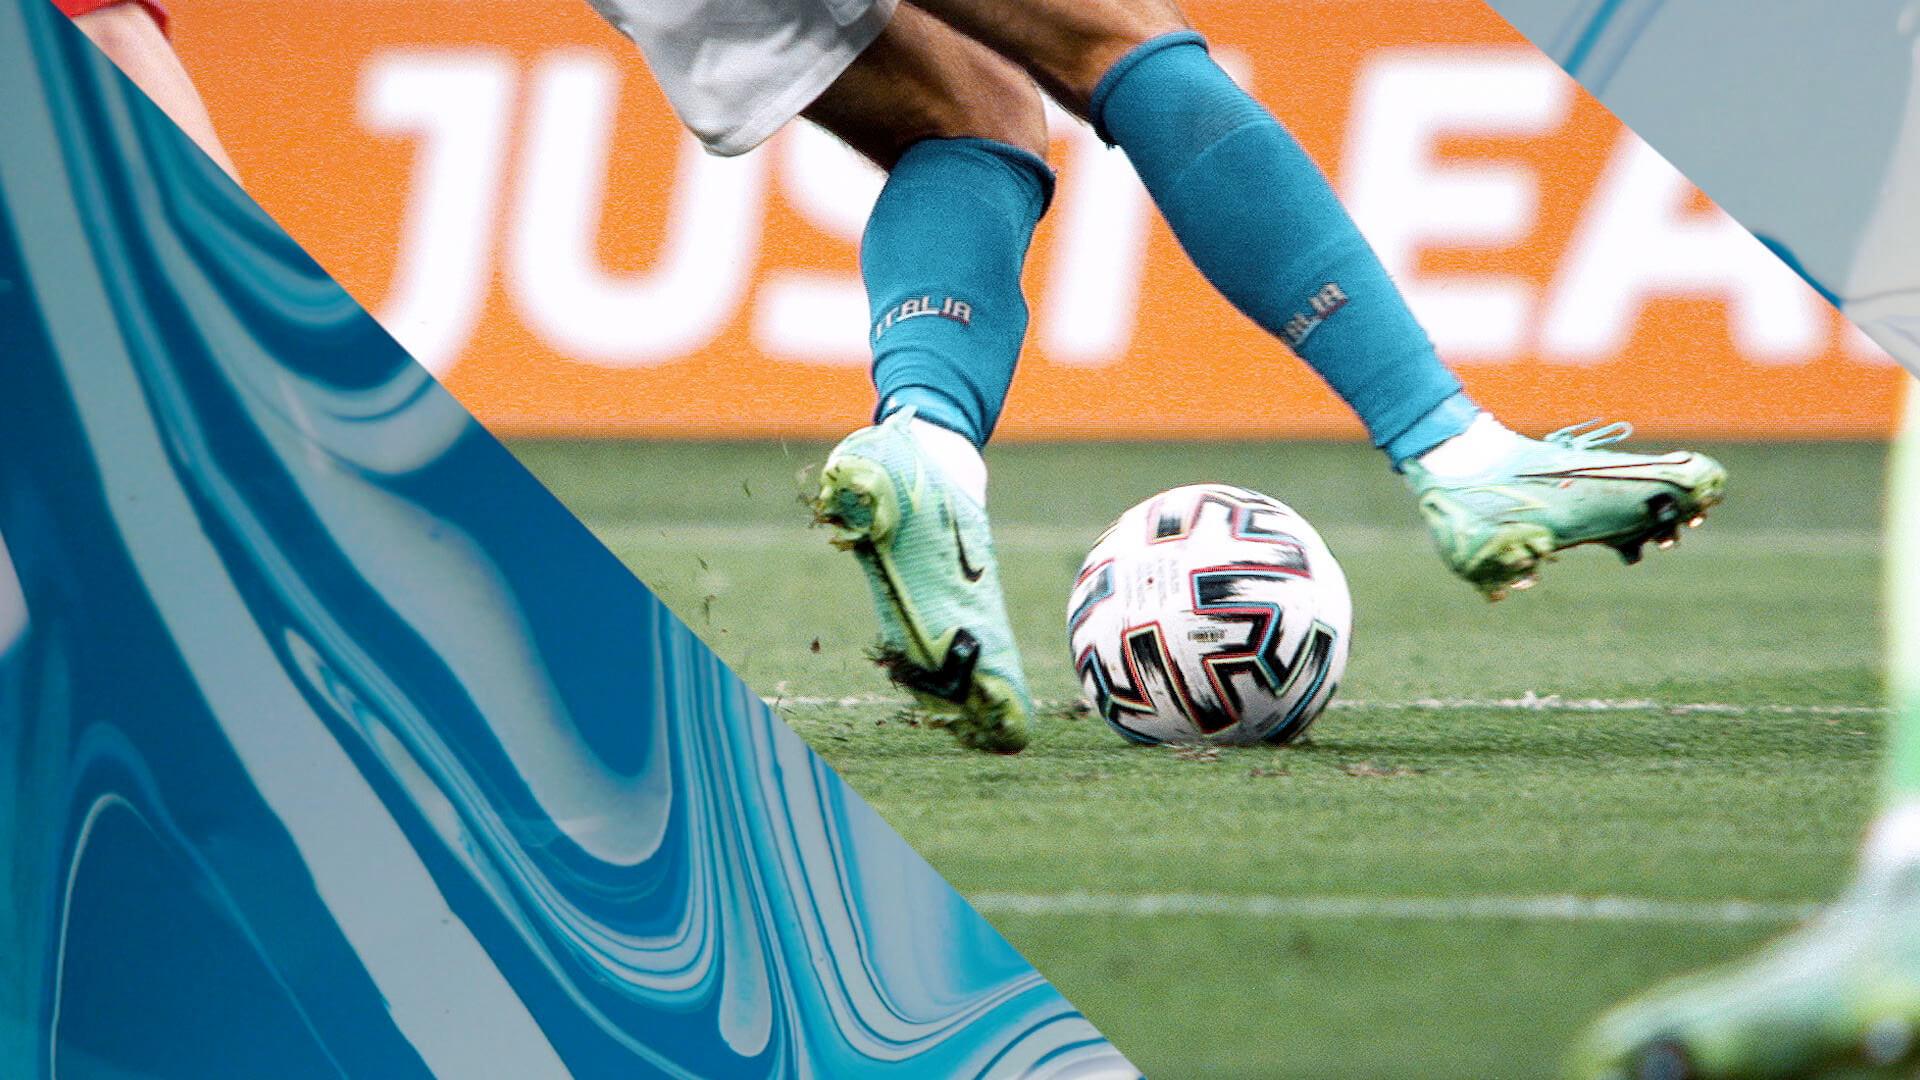 Craig Black_UEFA Euro 2020 Football Championship_Acrylic Fusion